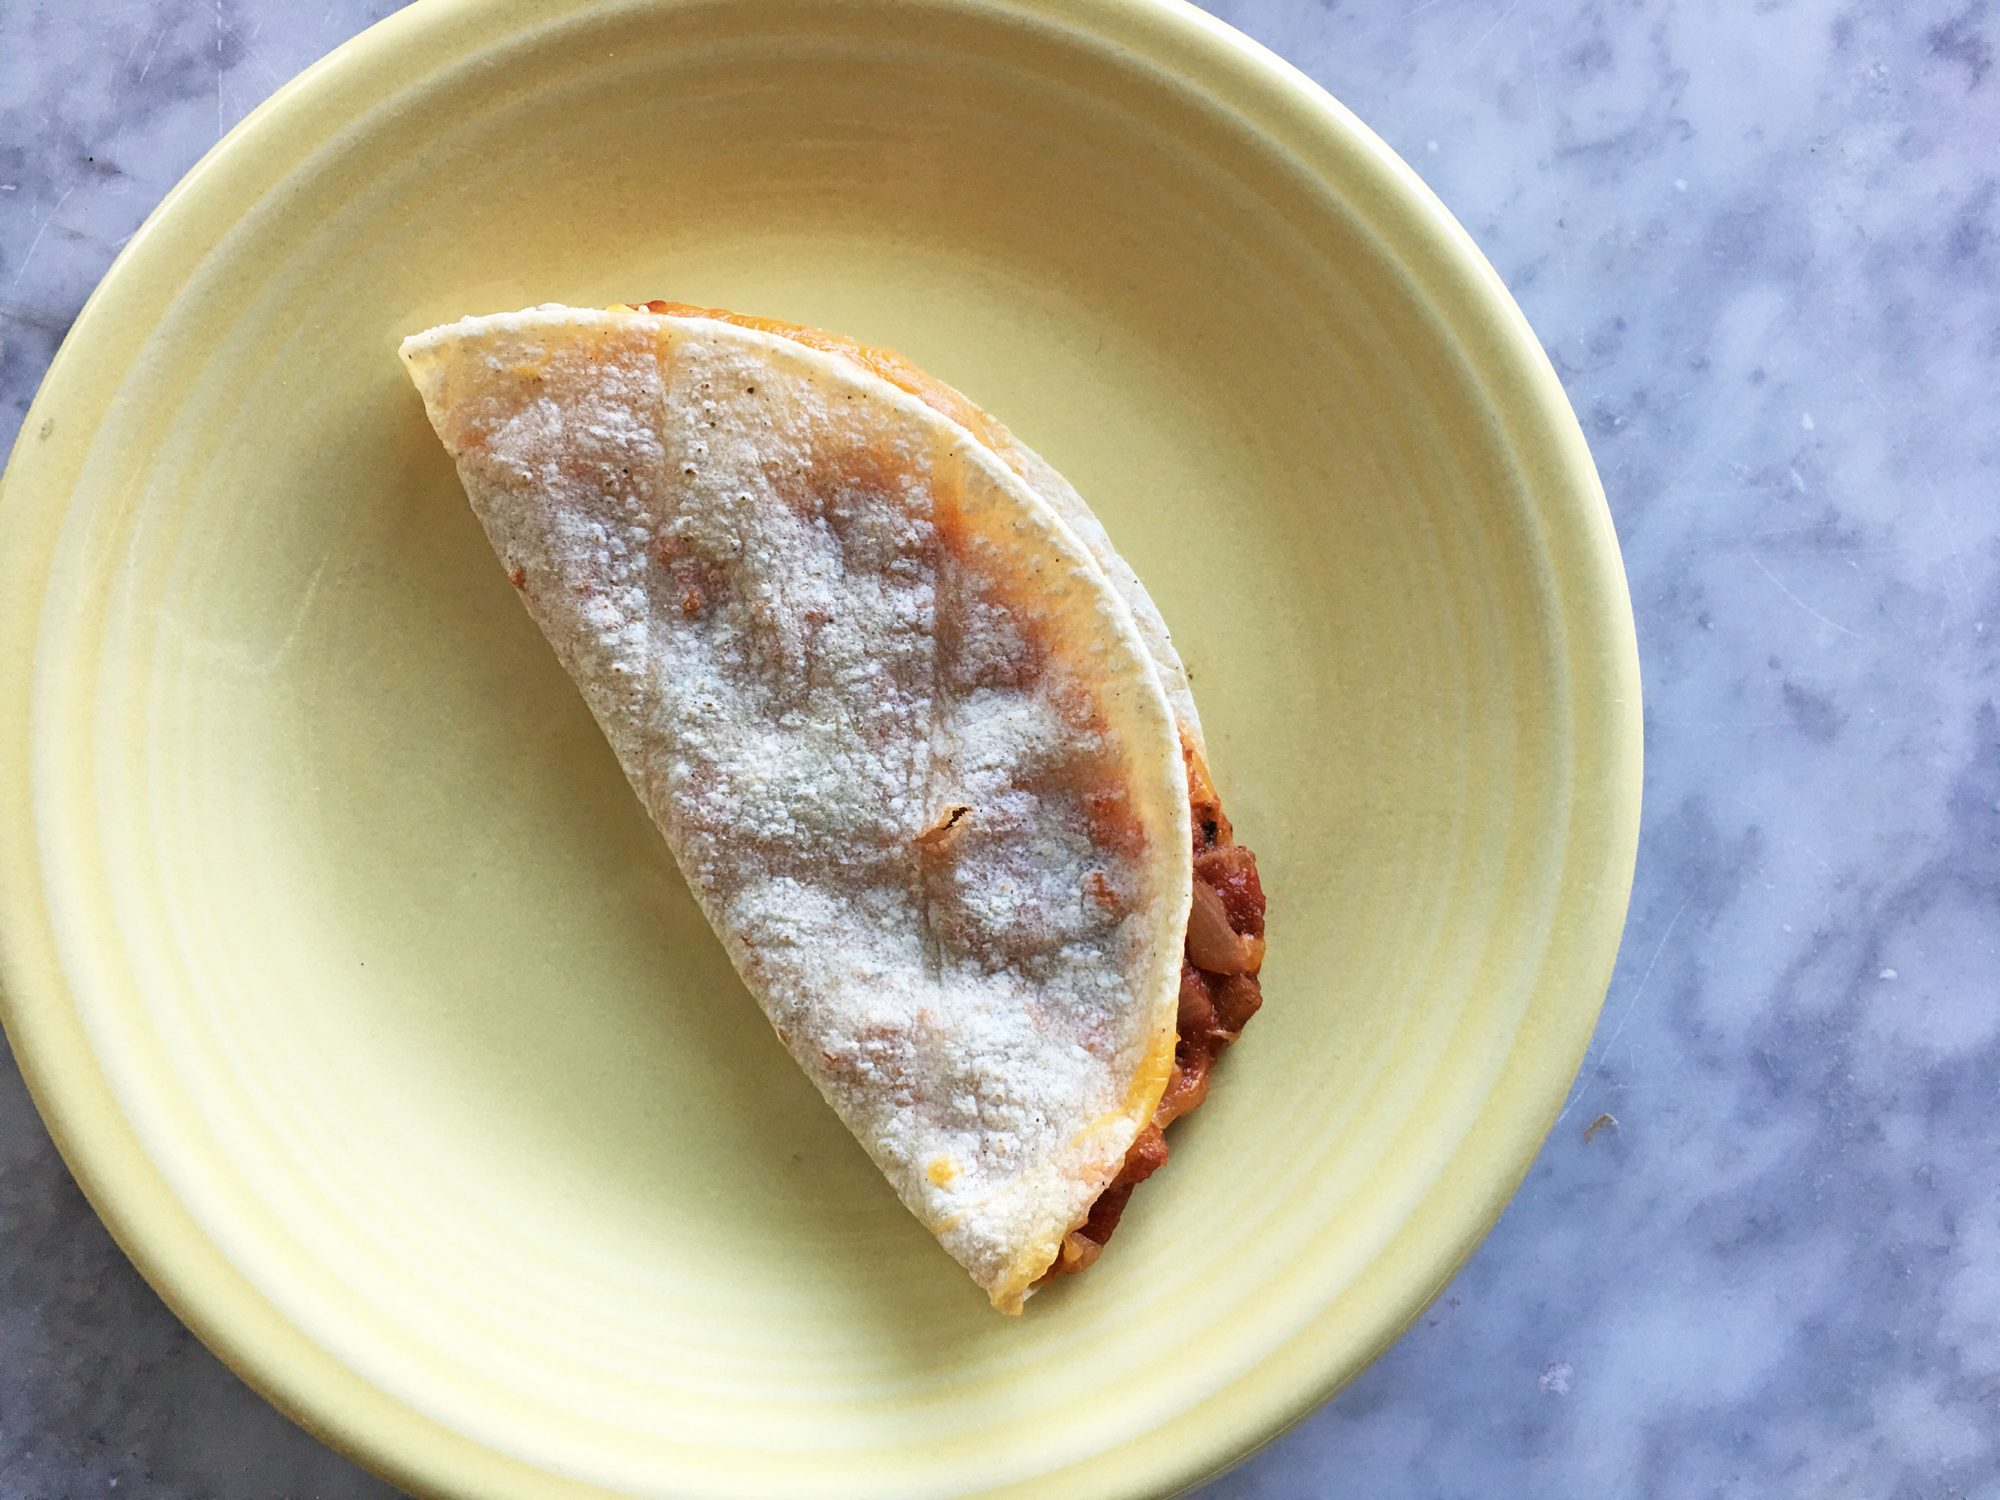 toaster-oven-quesadilla-image